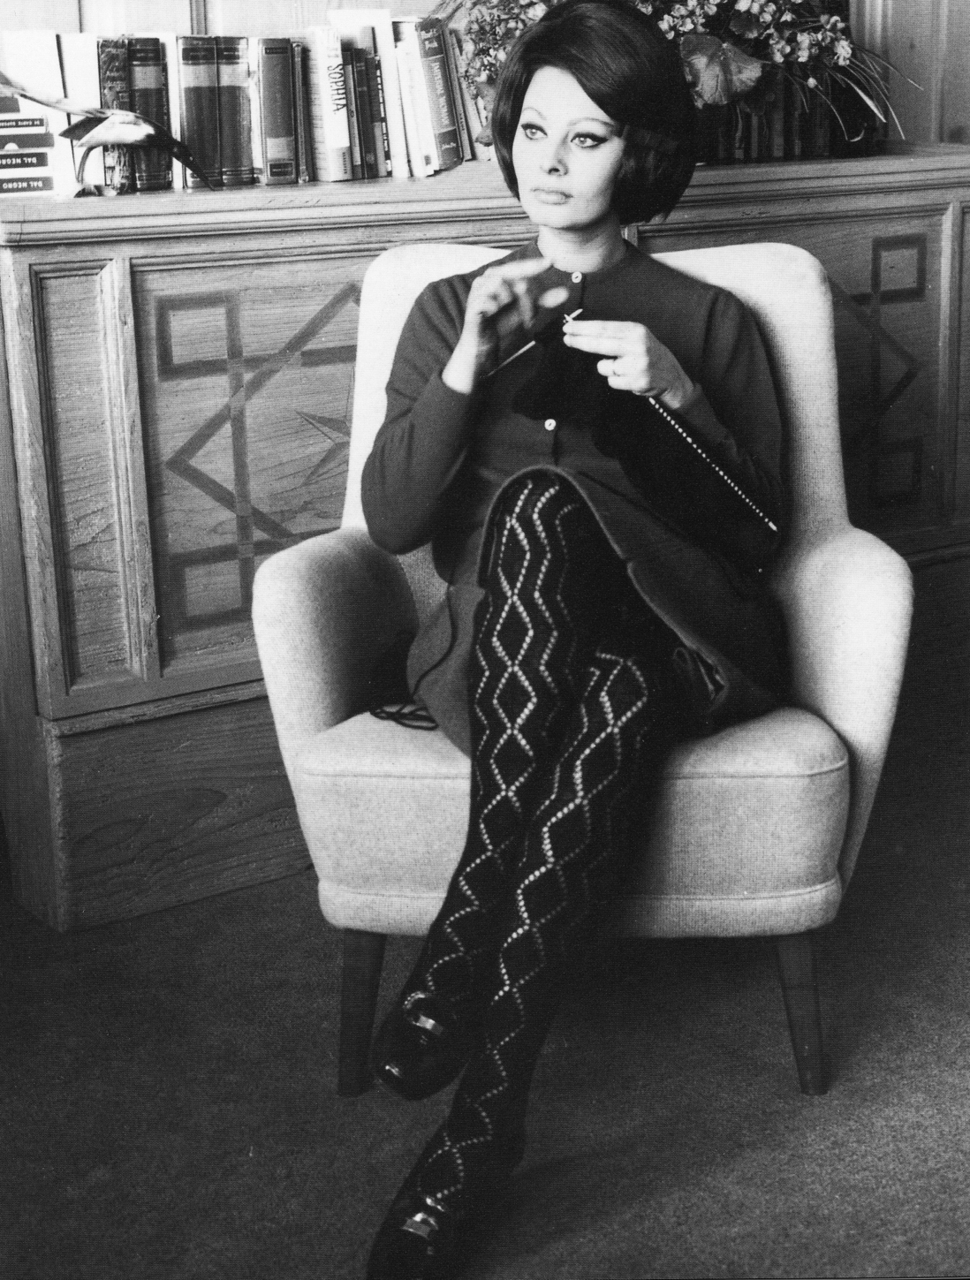 Sophia Loren breit ergens in de jaren '60? Fot afkomstig van http://feitoamao.tumblr.com/post/2054168872/missviciouslovestoknit-vintagegal-sophia